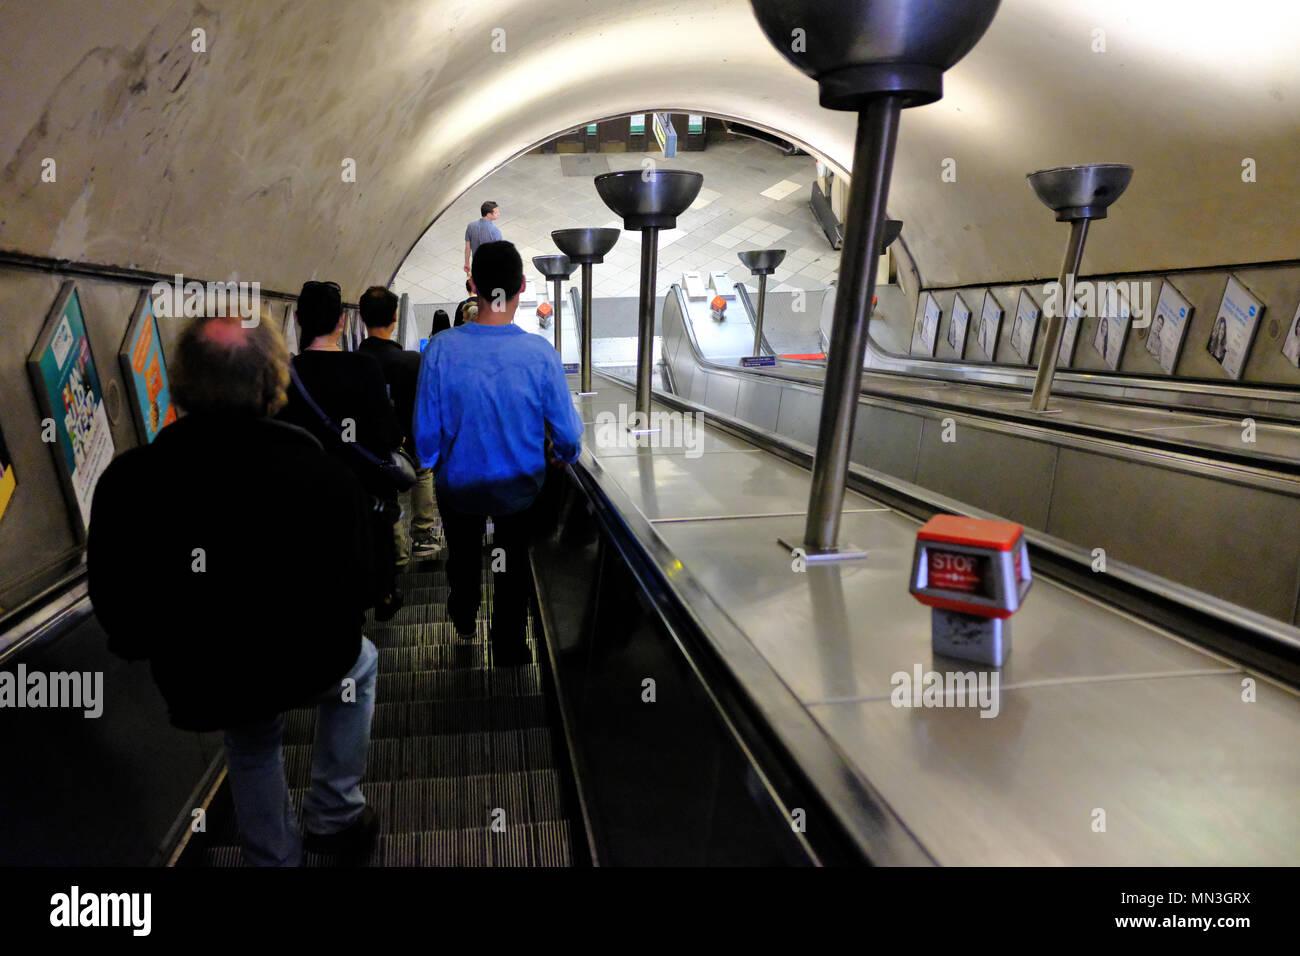 Escalators at Tooting Broadway underground station - London SW17 - Stock Image